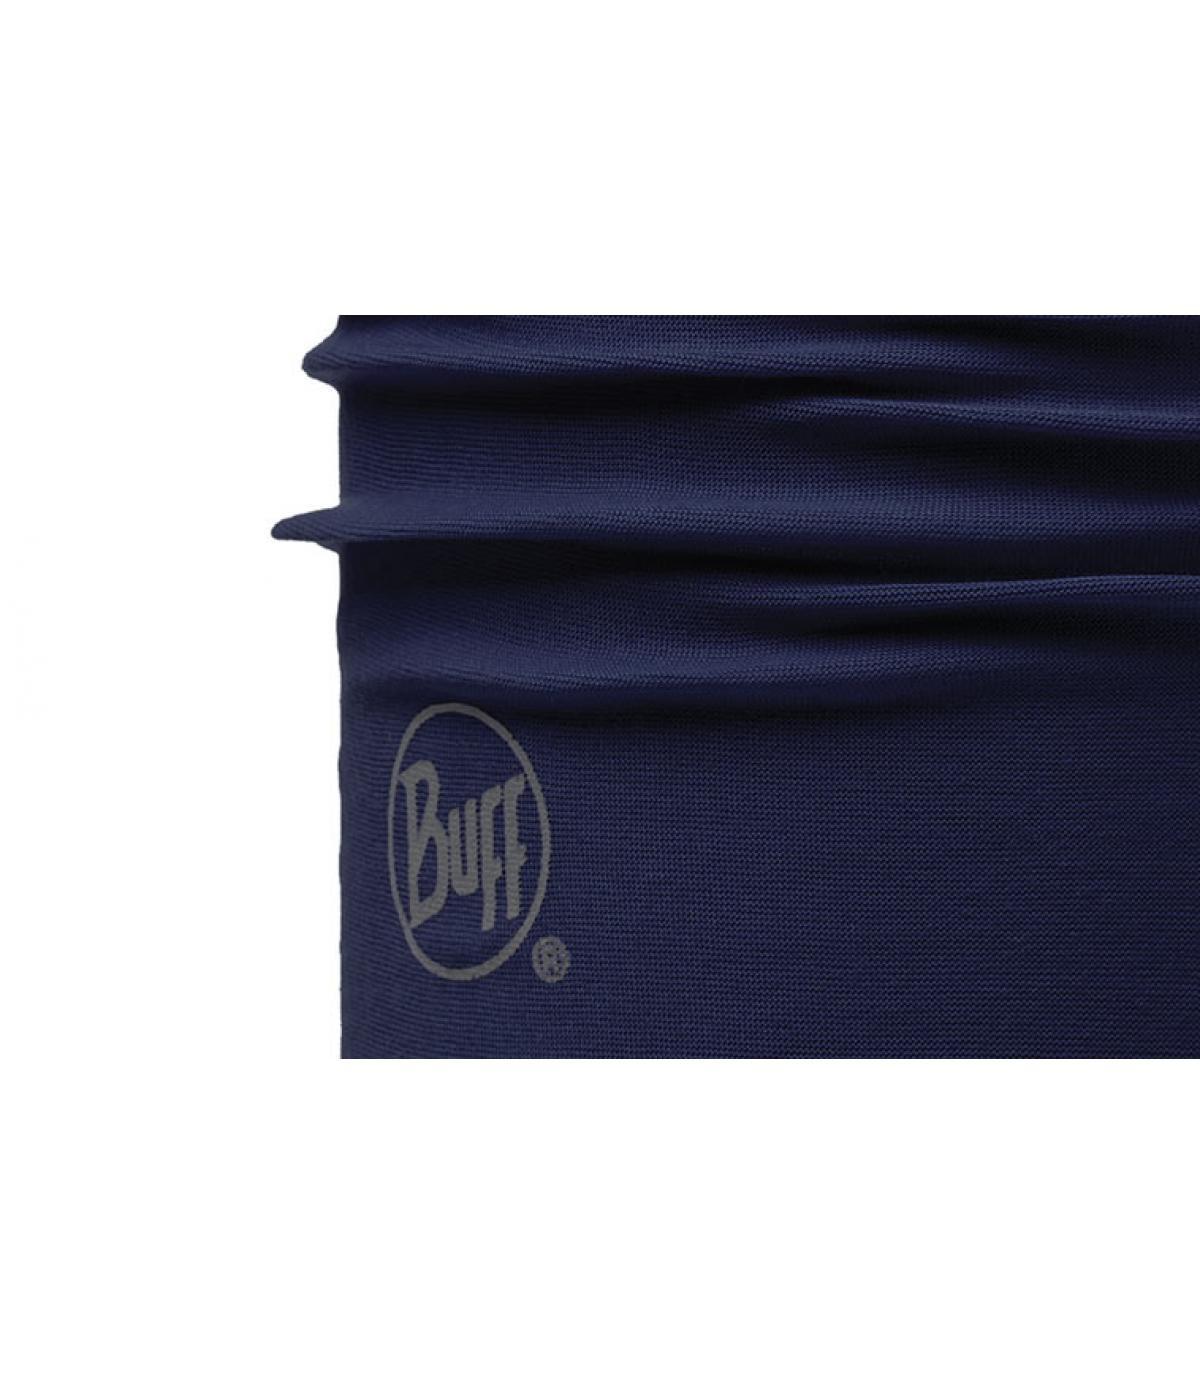 Blauw neckwear Buff